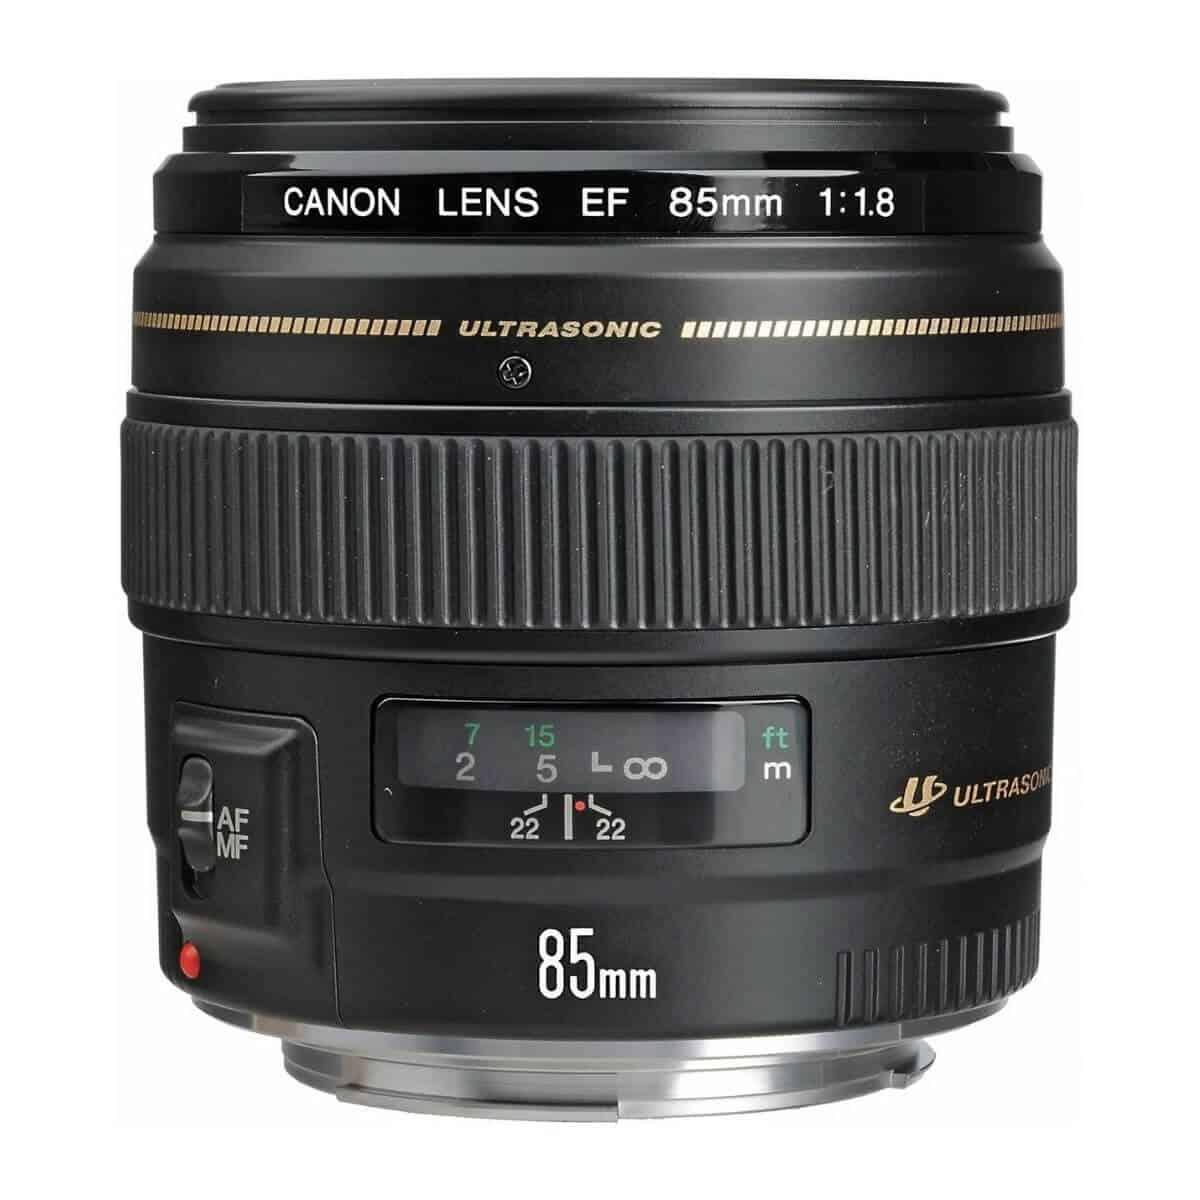 Canon 85mm f/1.8 lens.